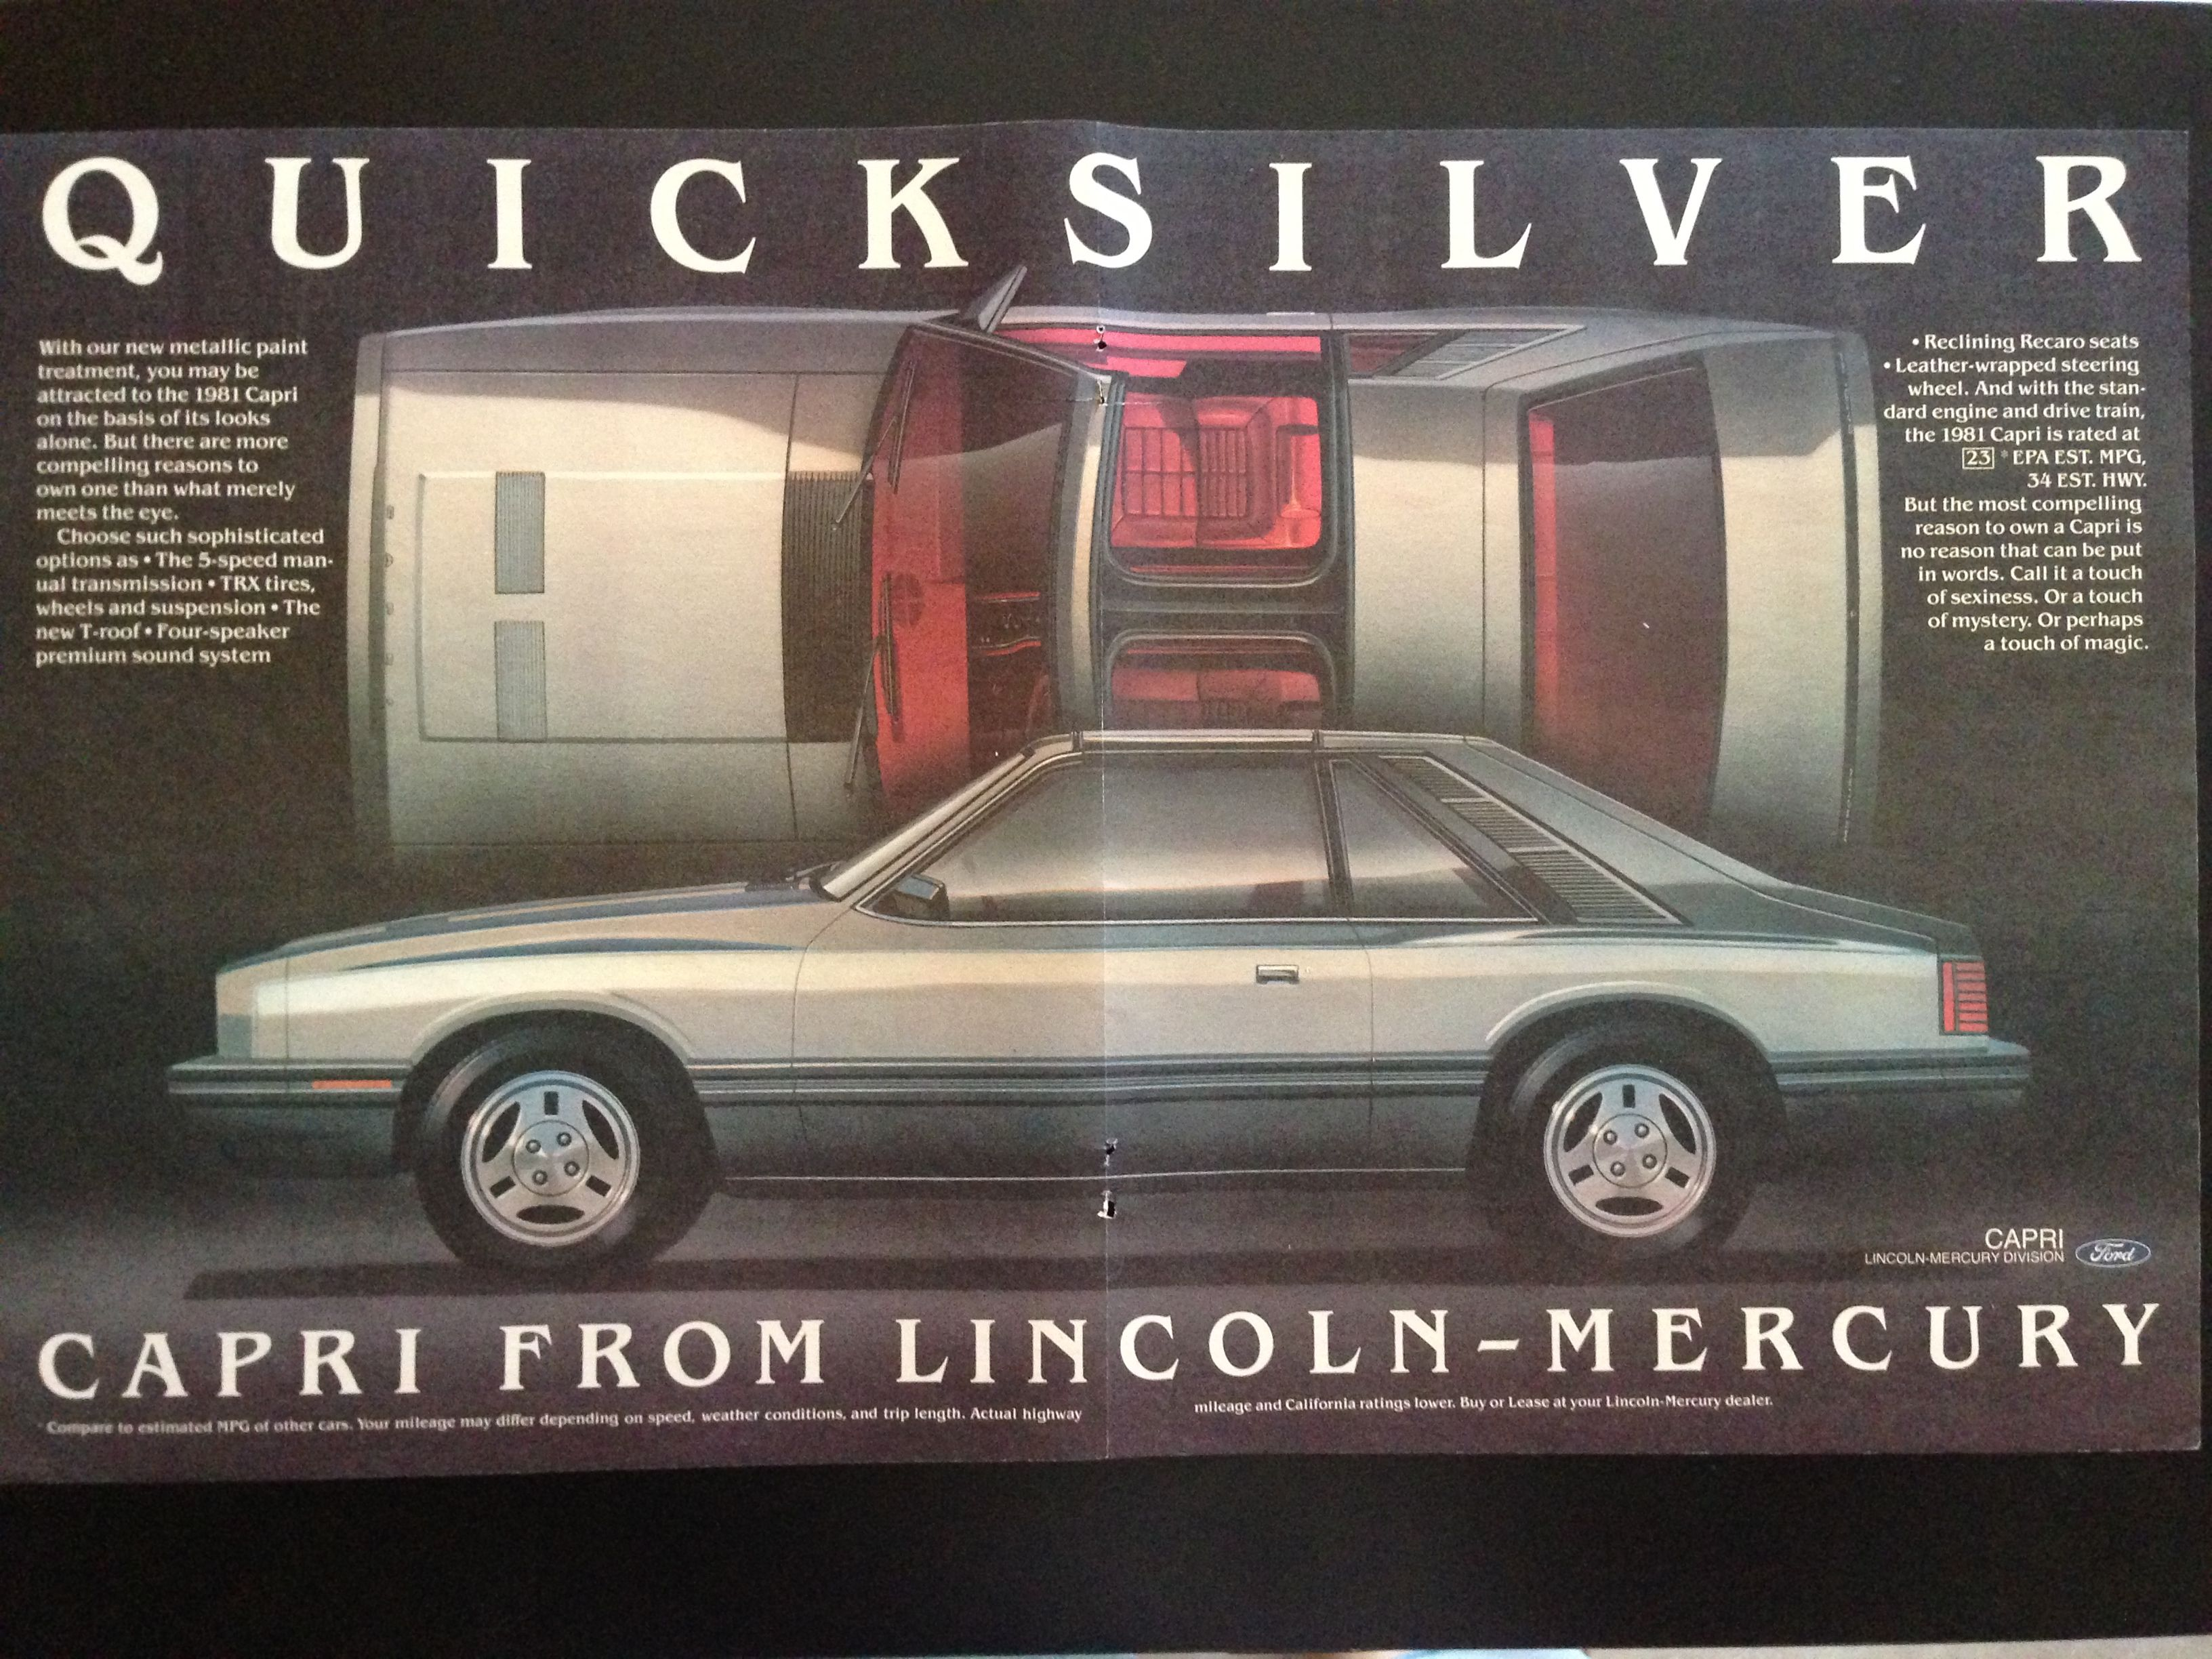 1981 Mercury Capri Advertised As Lincoln Mercury Dual Page Ad Mercury Capri Lincoln Mercury Car Advertising